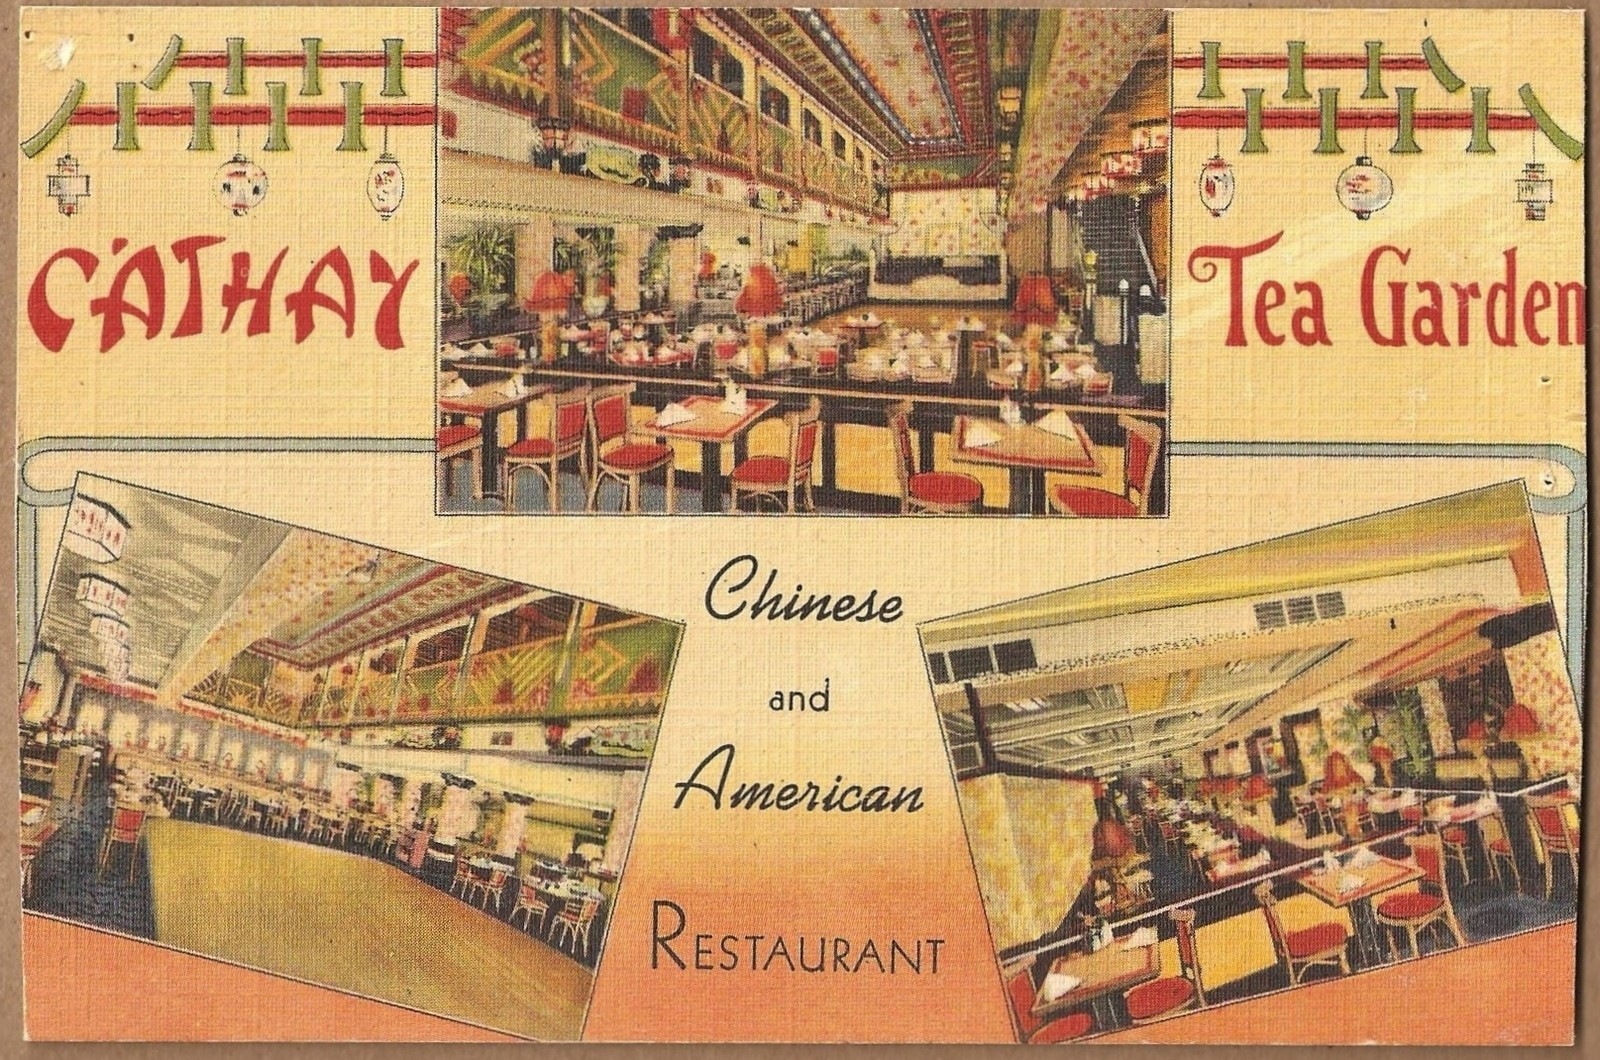 POSTCARDS: Cathay Tea Garden Restaurant in Philadelphia